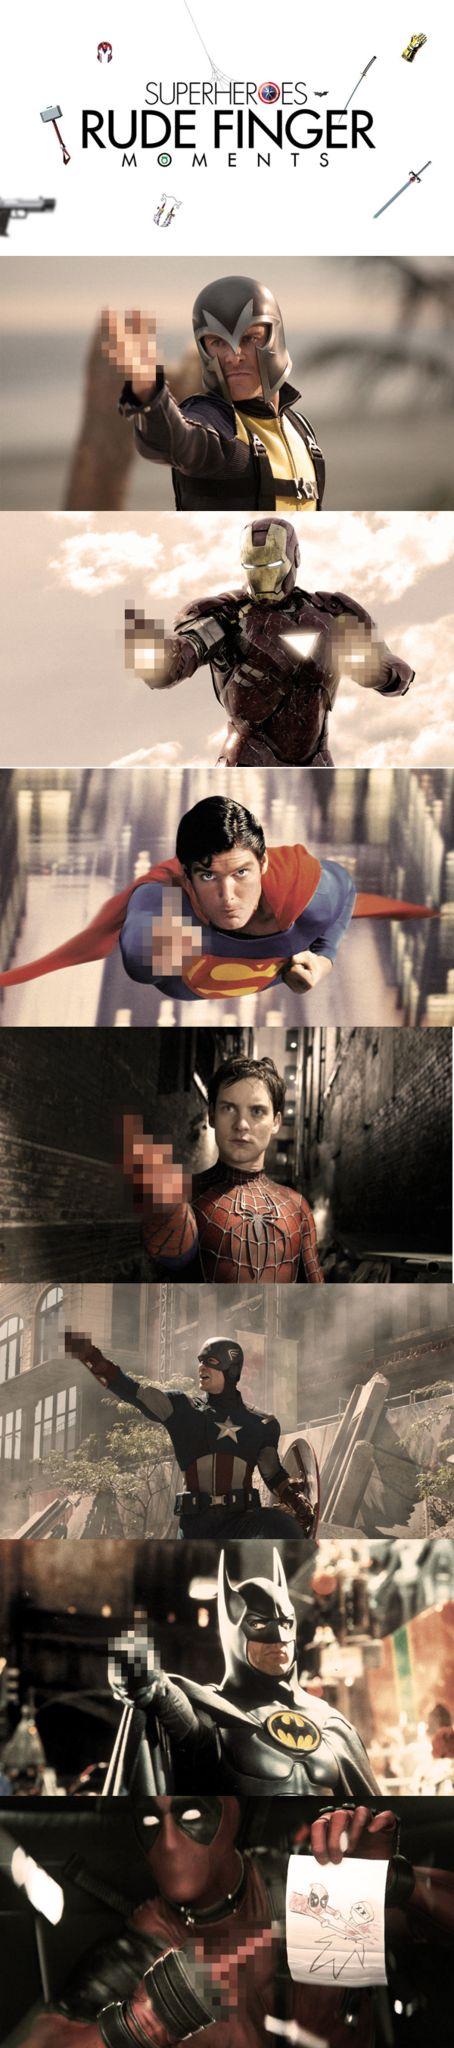 If Superheroes reacted like us regular folks. 'Superheroes - Rude Finger Moments' by Danish Hasan